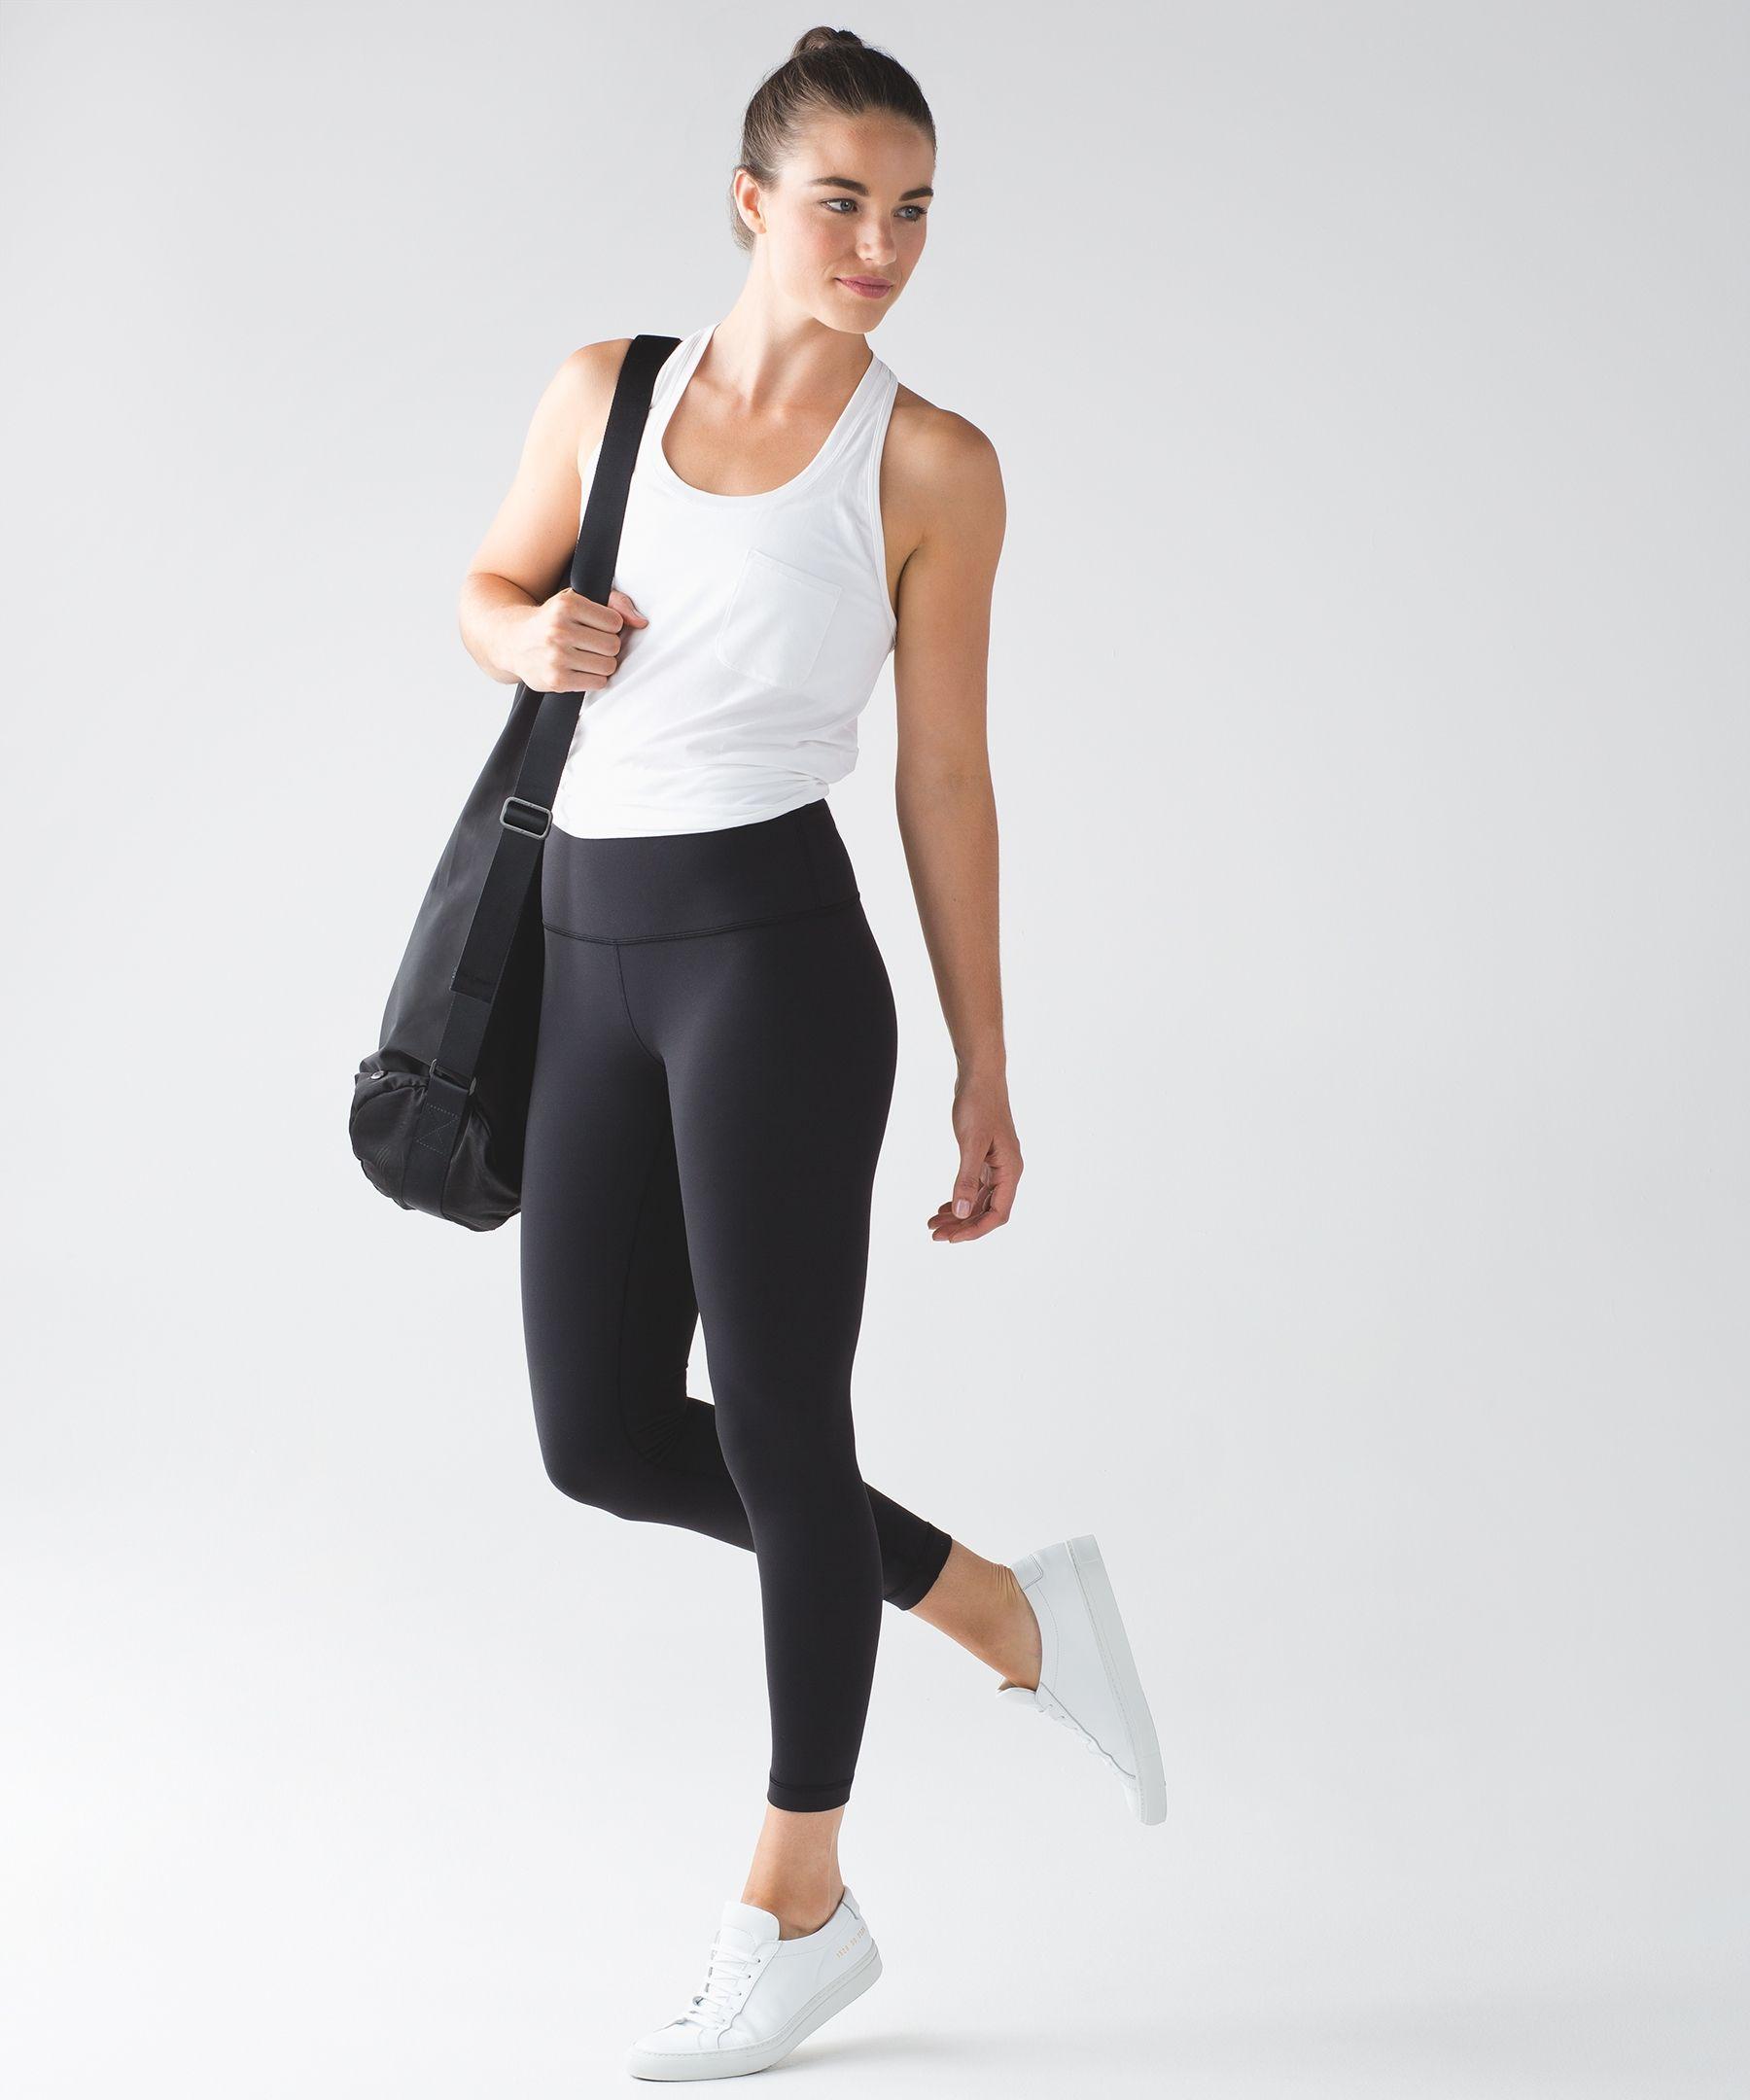 785d264e6de65 High-Rise Yoga Pants - (Black, Size 10) - High Times Pant *Full-On Luon -  lululemon